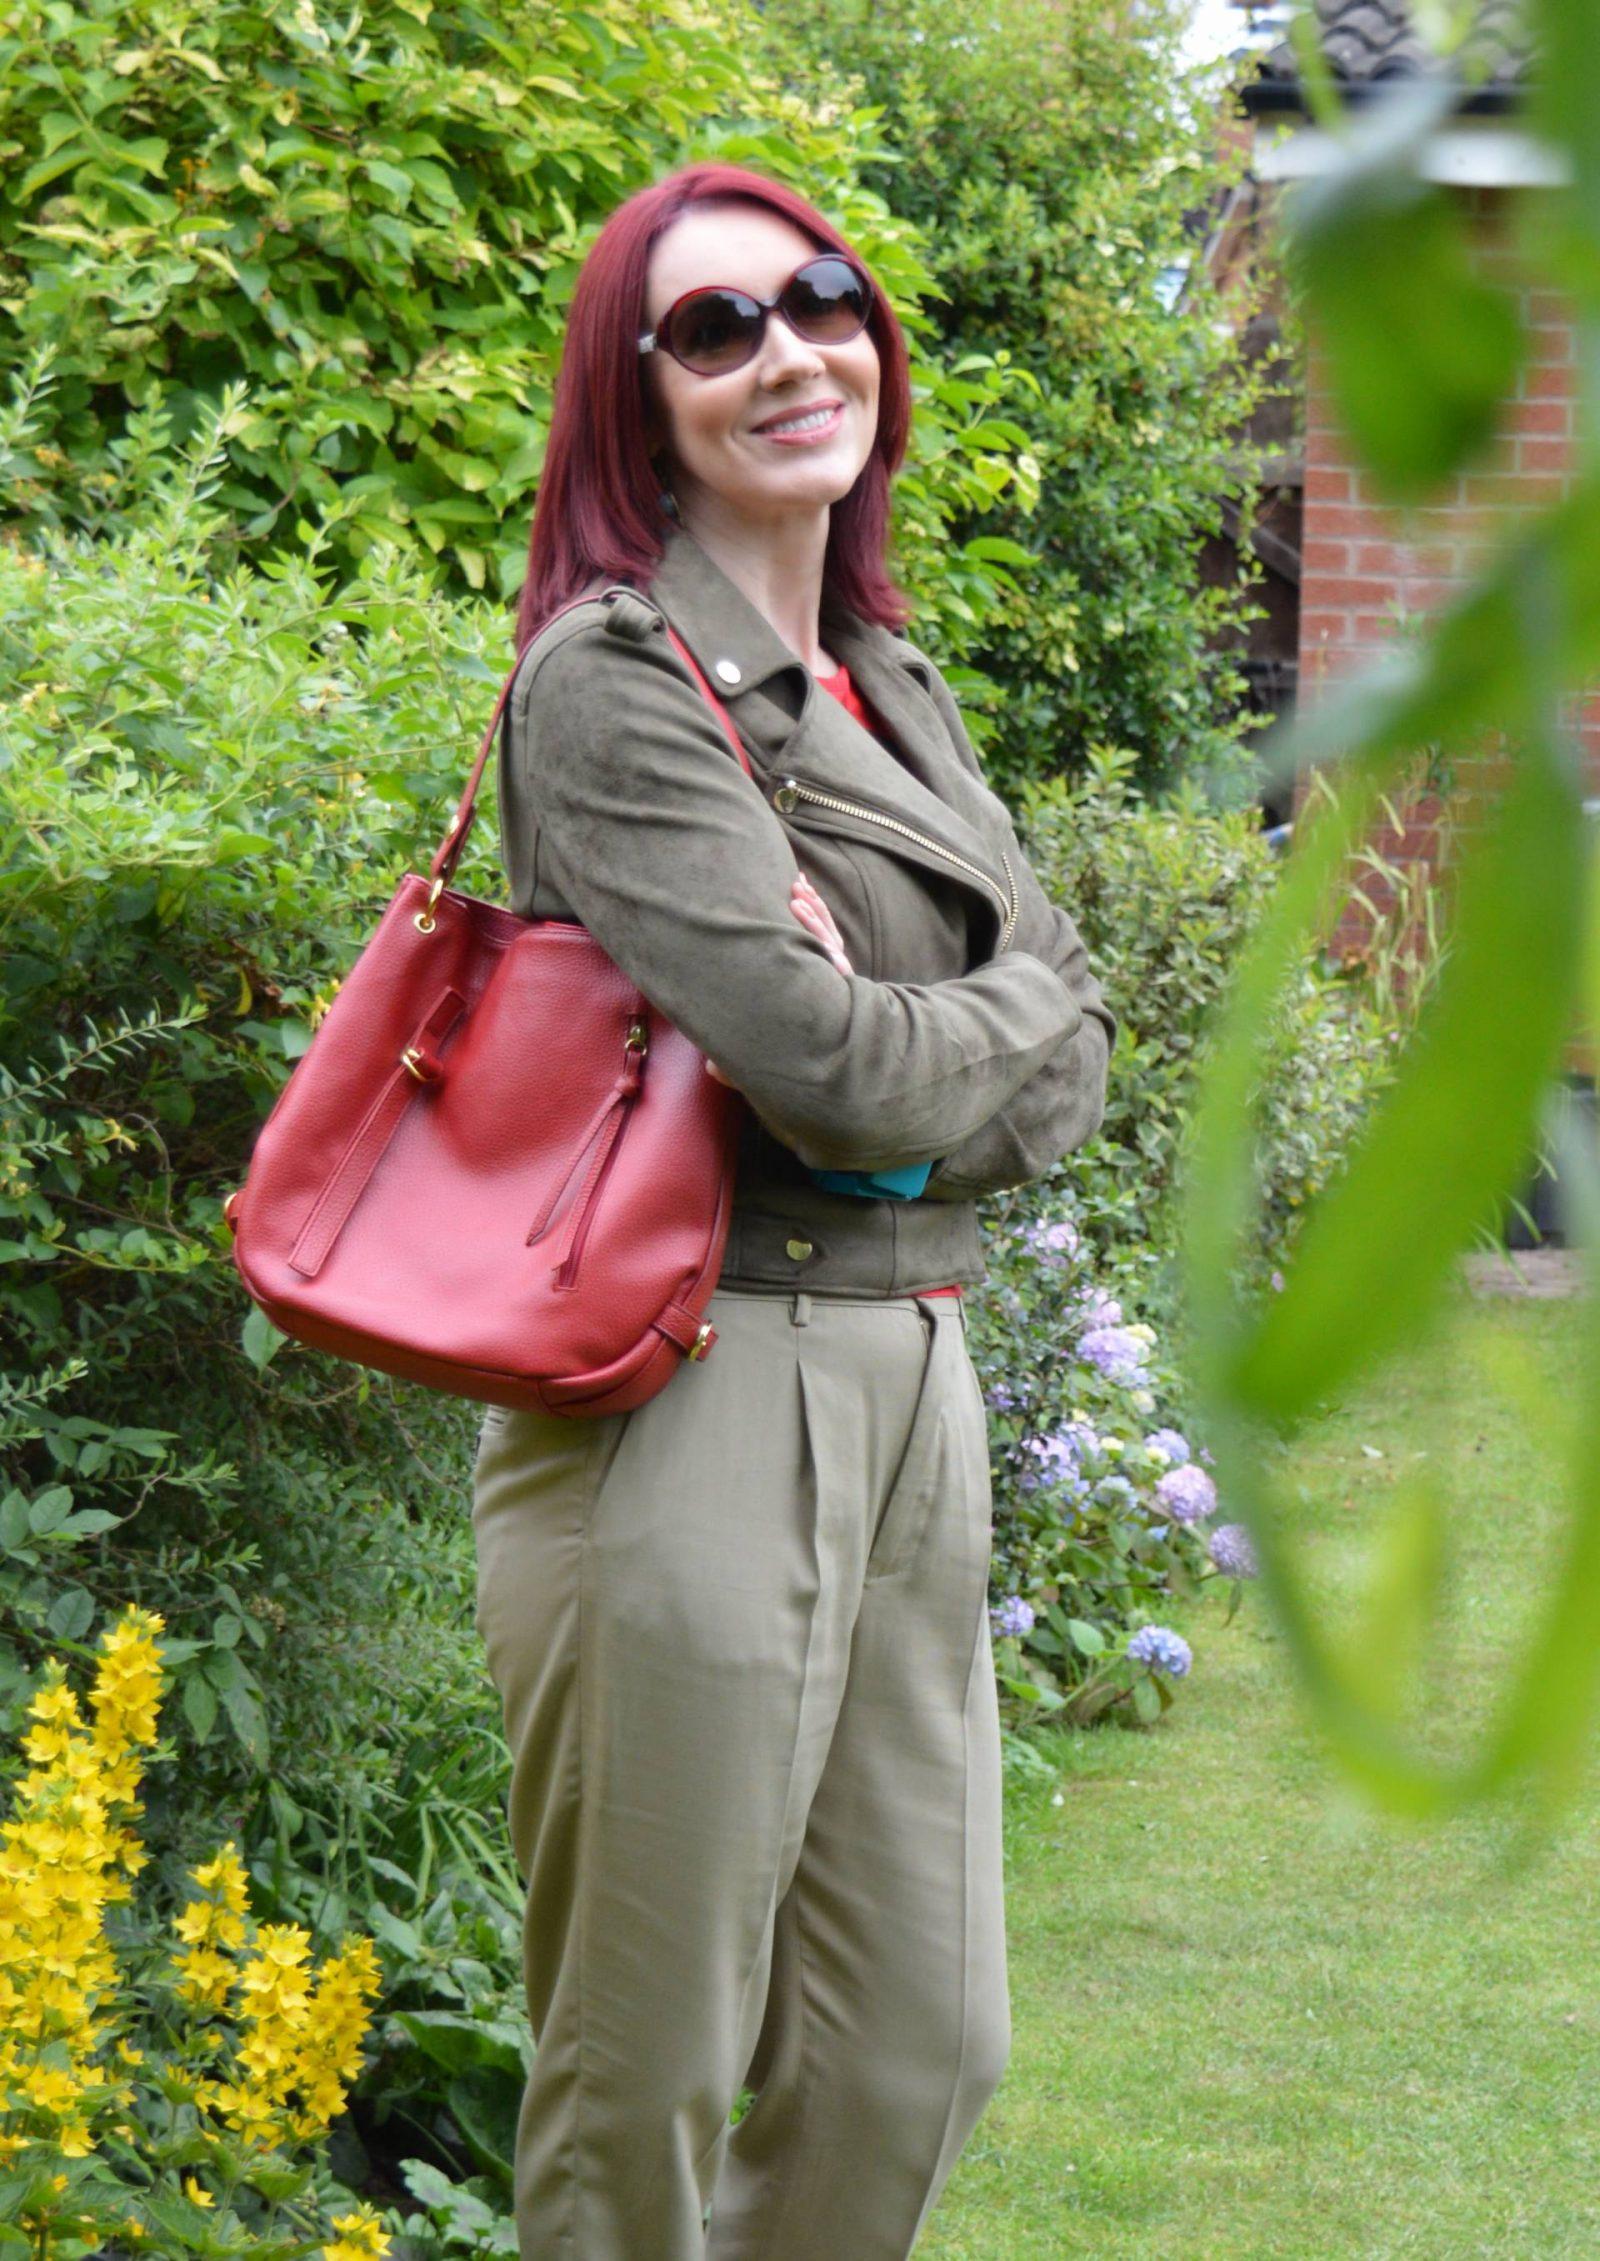 Shades of Khaki With Red Accents River Island khaki biker jacket Zara khaki trousers